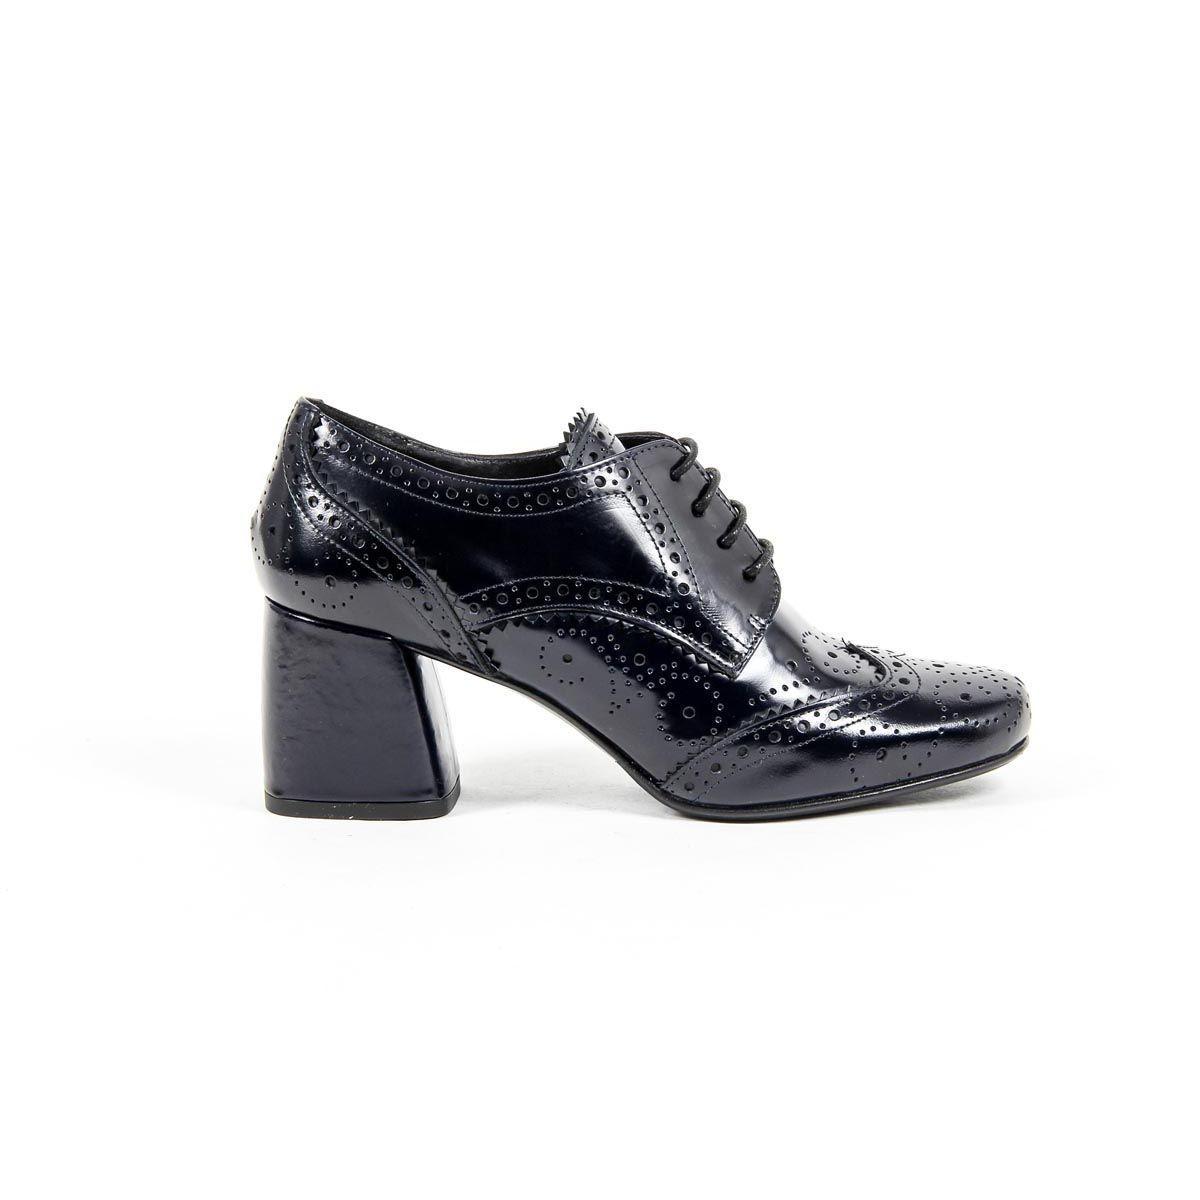 0cedc5950d8 Versace 19.69 Abbigliamento Sportivo Srl Milano Italia Womens Heeled ...